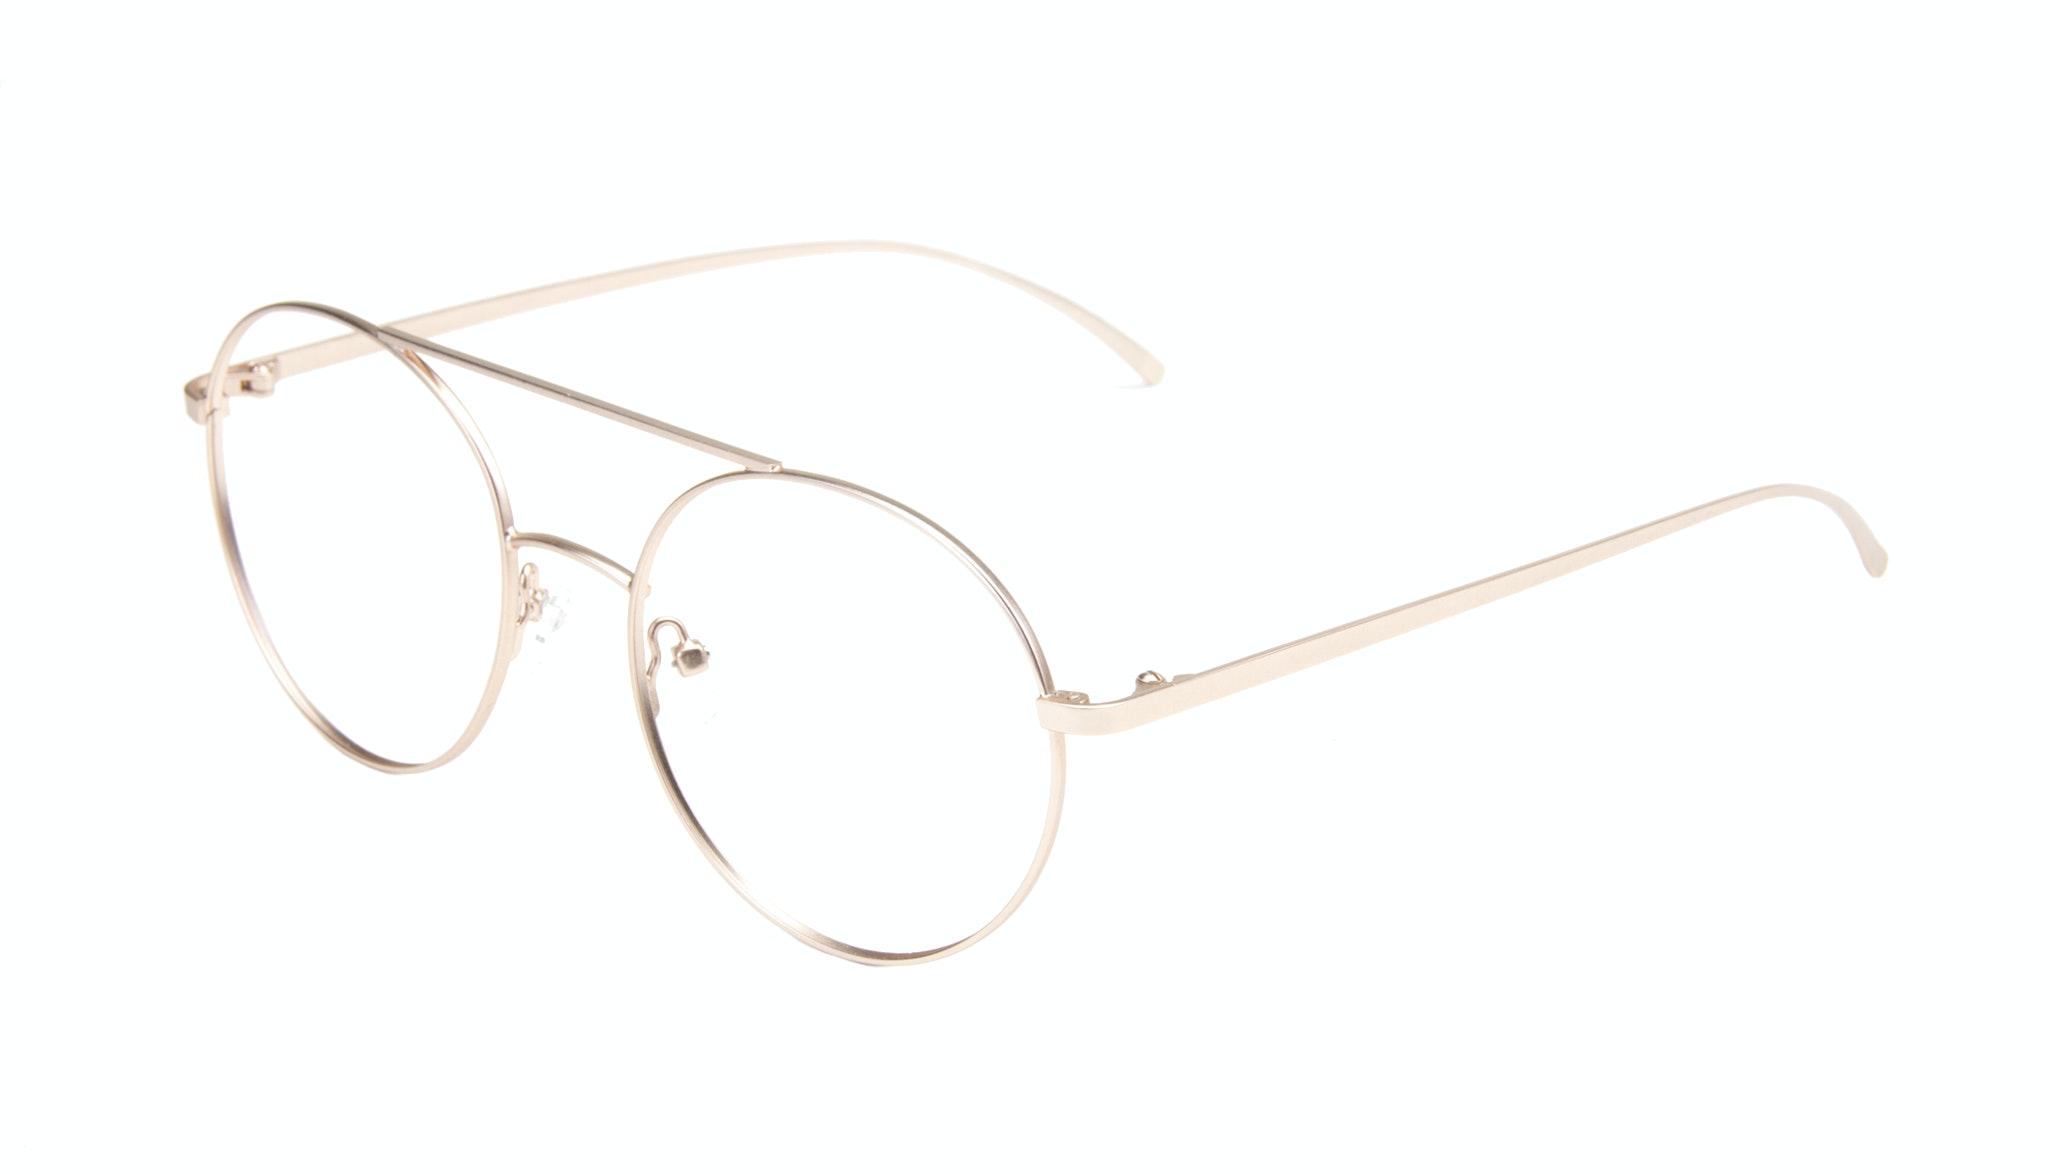 Affordable Fashion Glasses Aviator Round Eyeglasses Women Baby Money Tilt